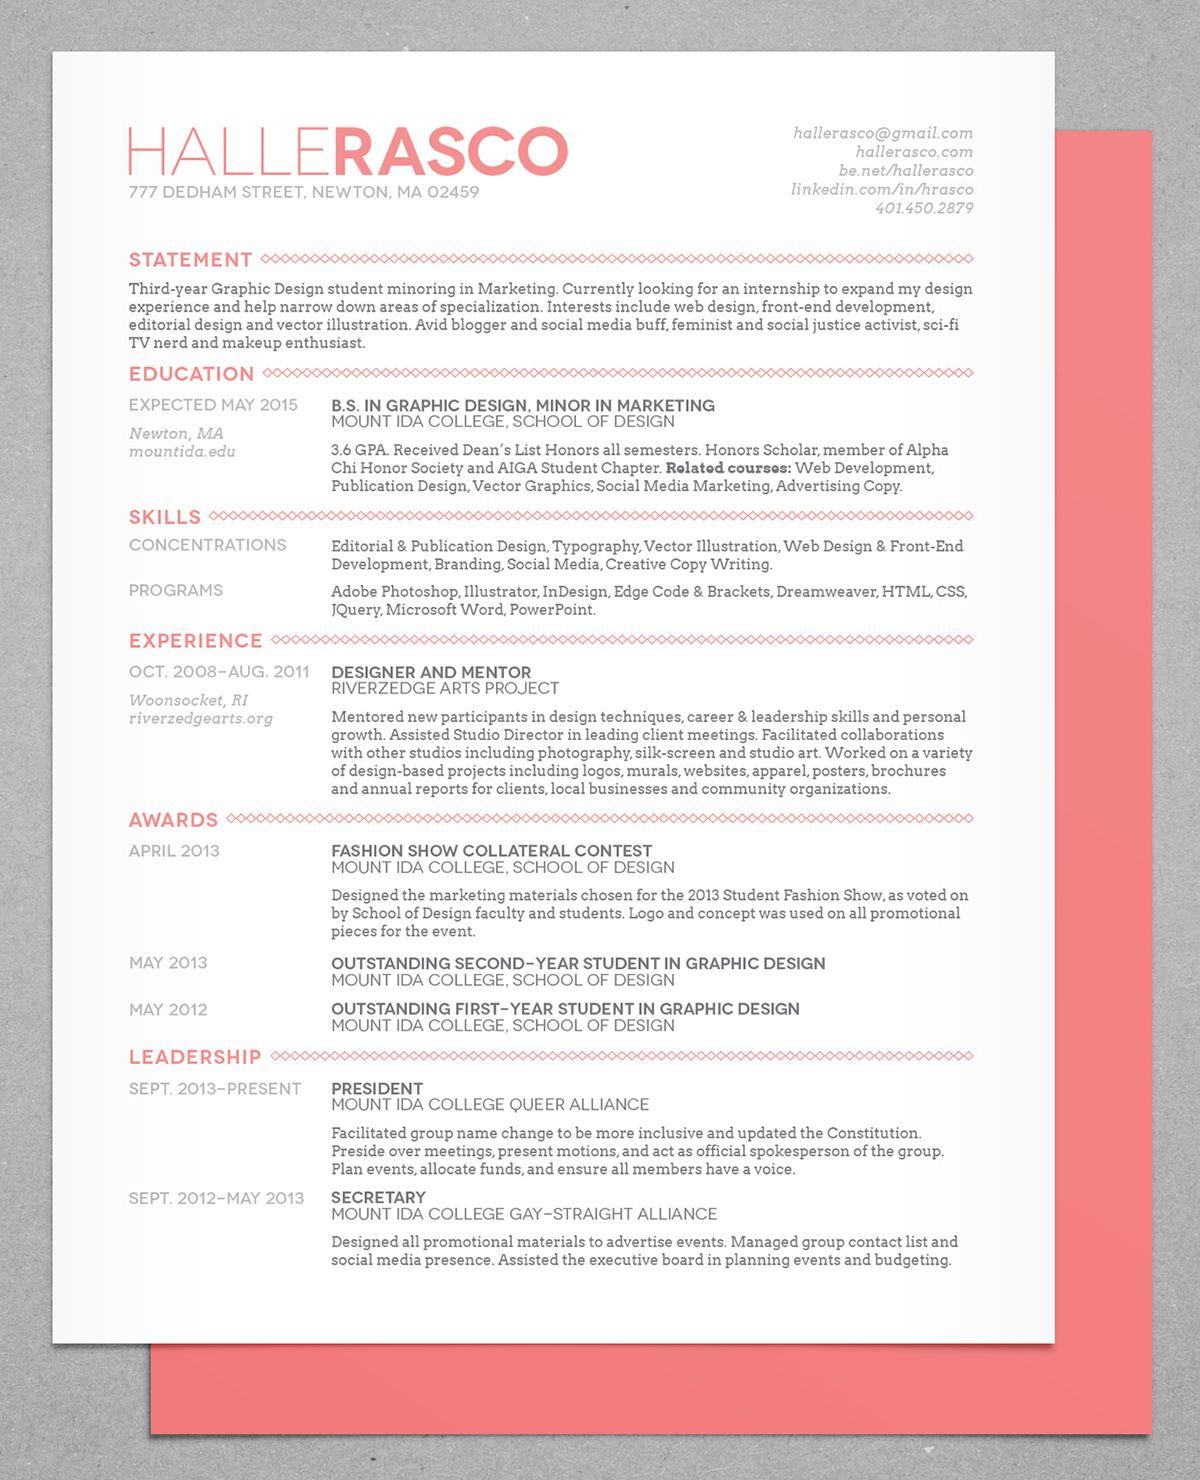 Halle Rasco Personal Branding 2013/14 on Behance